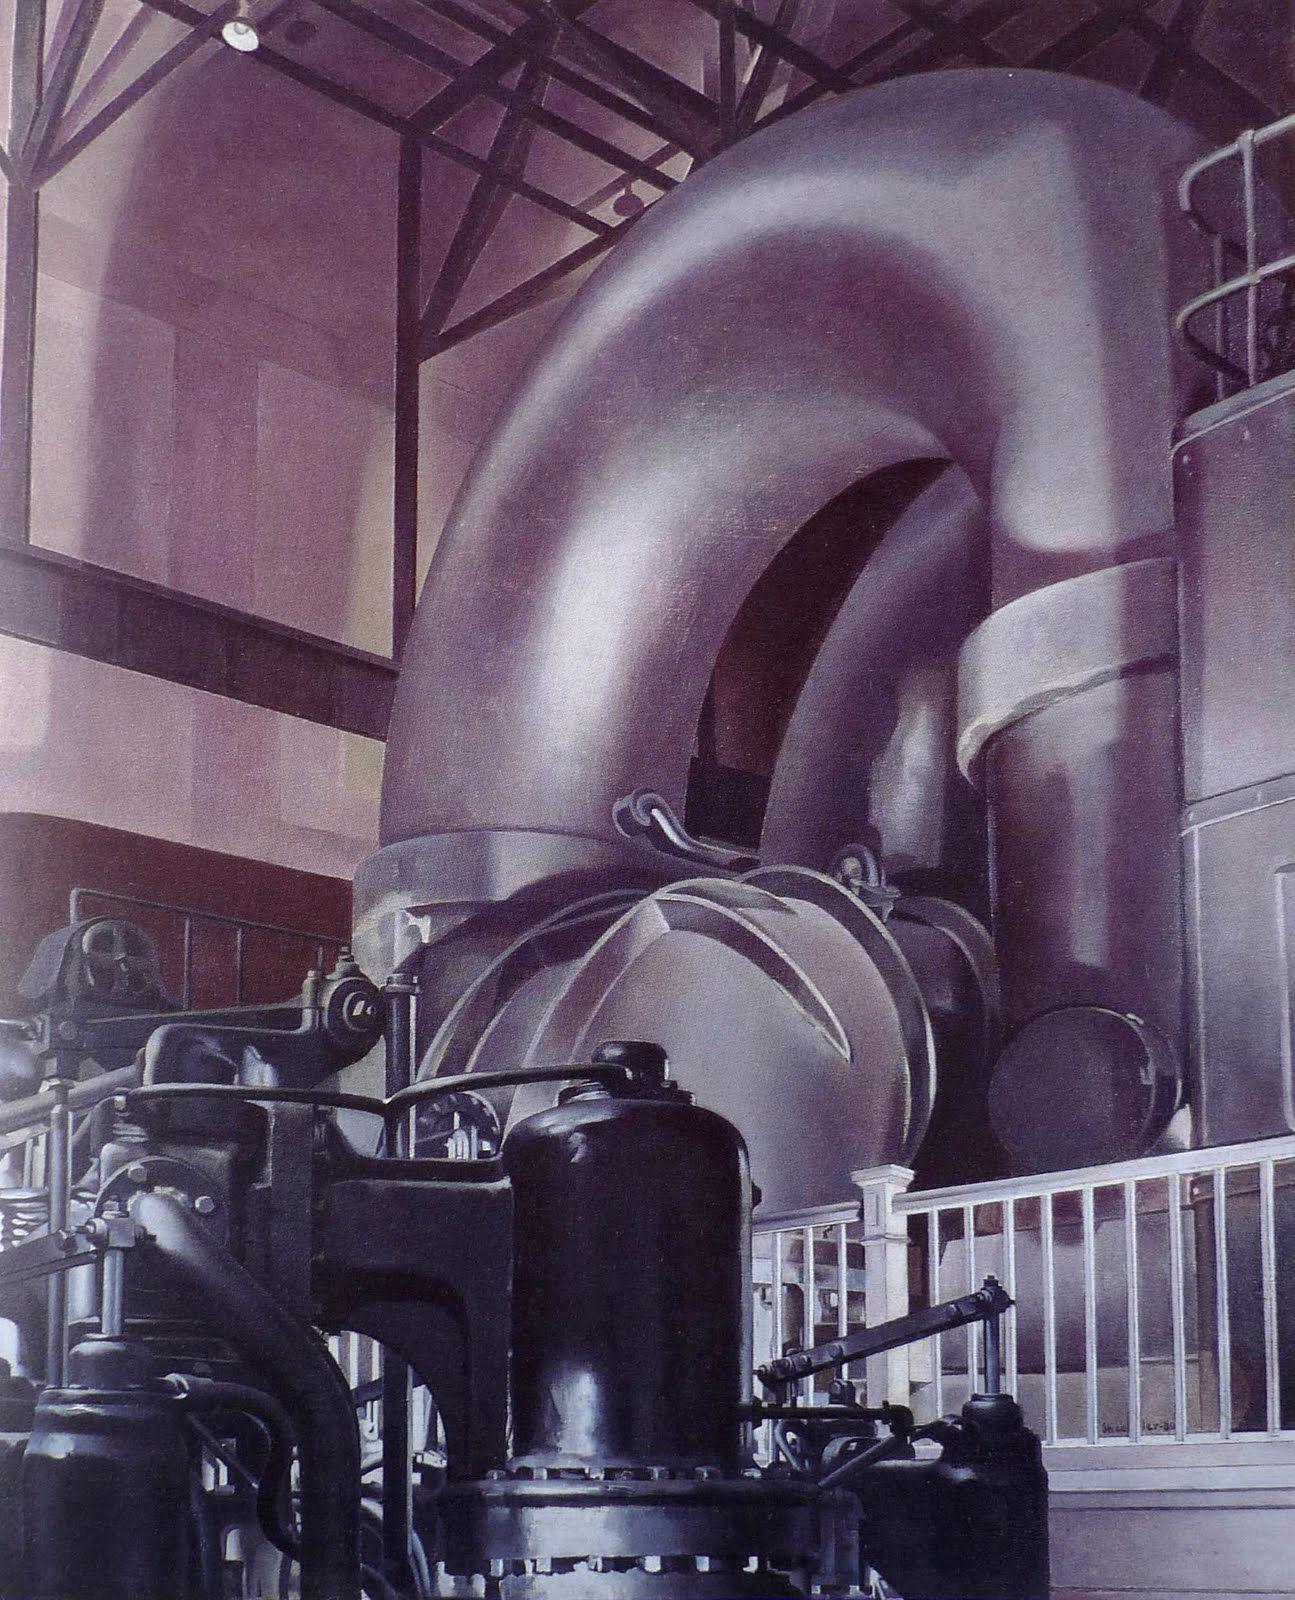 1939 The Steam Turbine Charles Sheeler Art